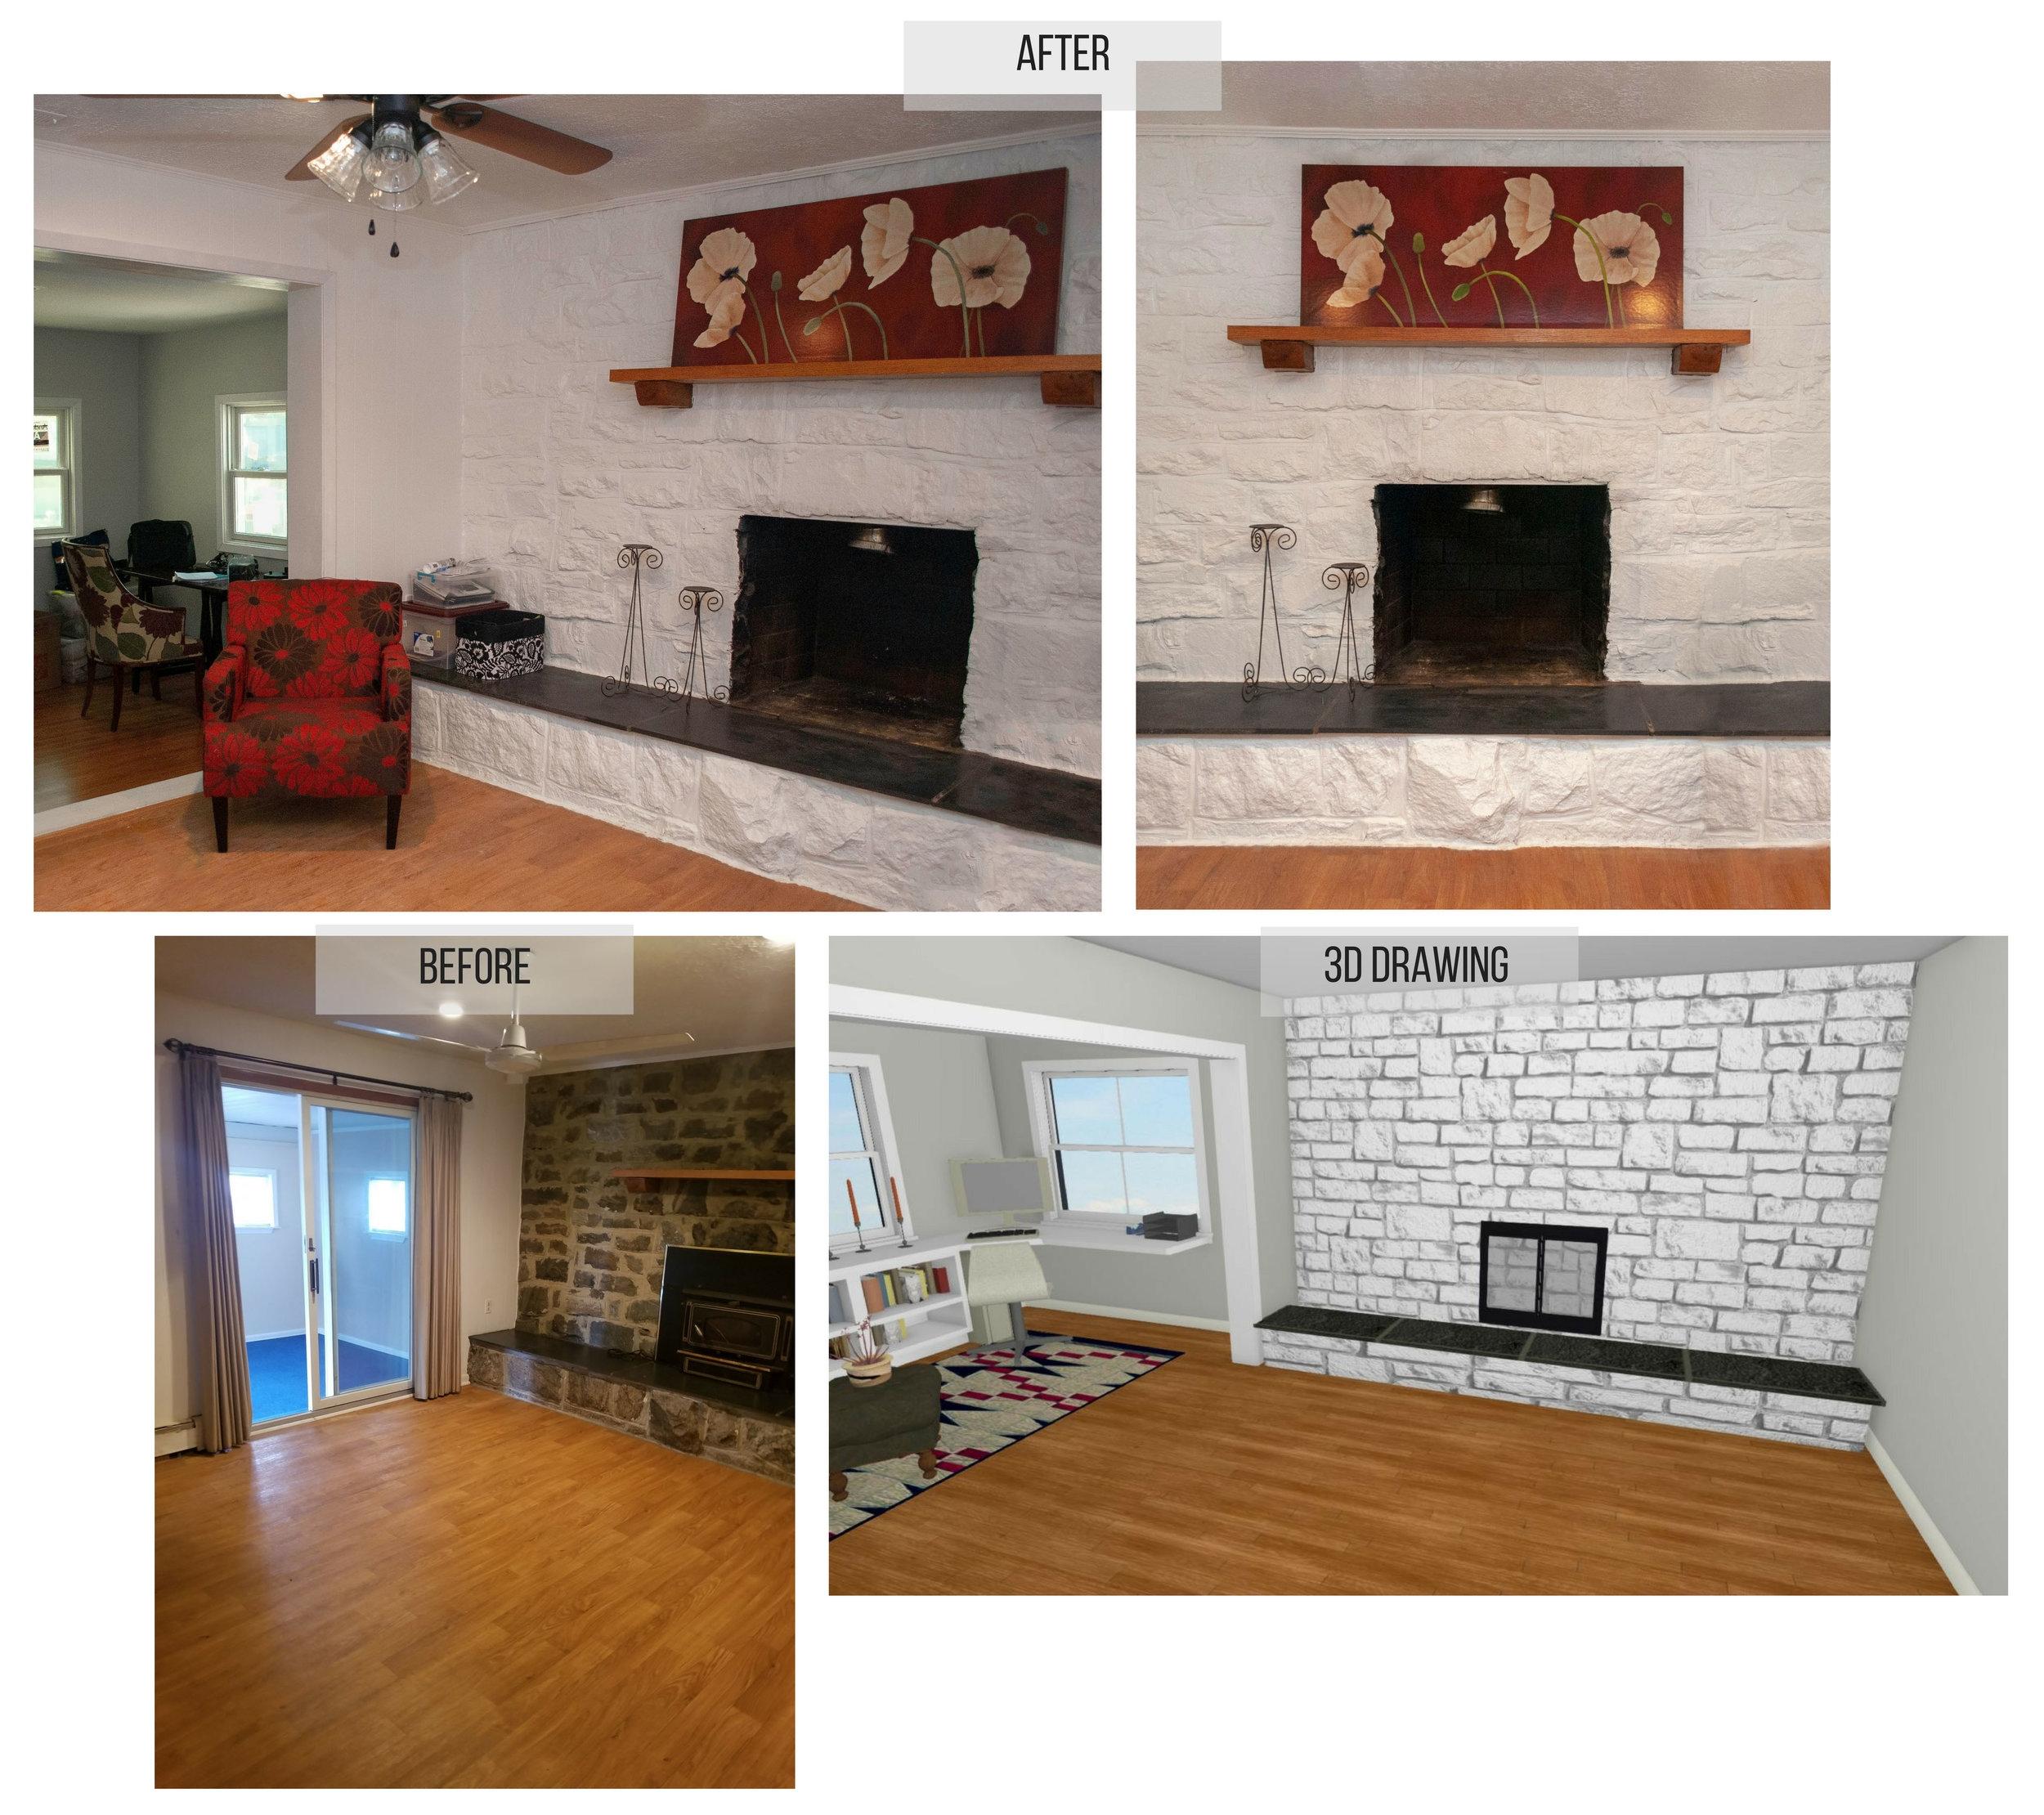 cohasset living room comparison.jpg